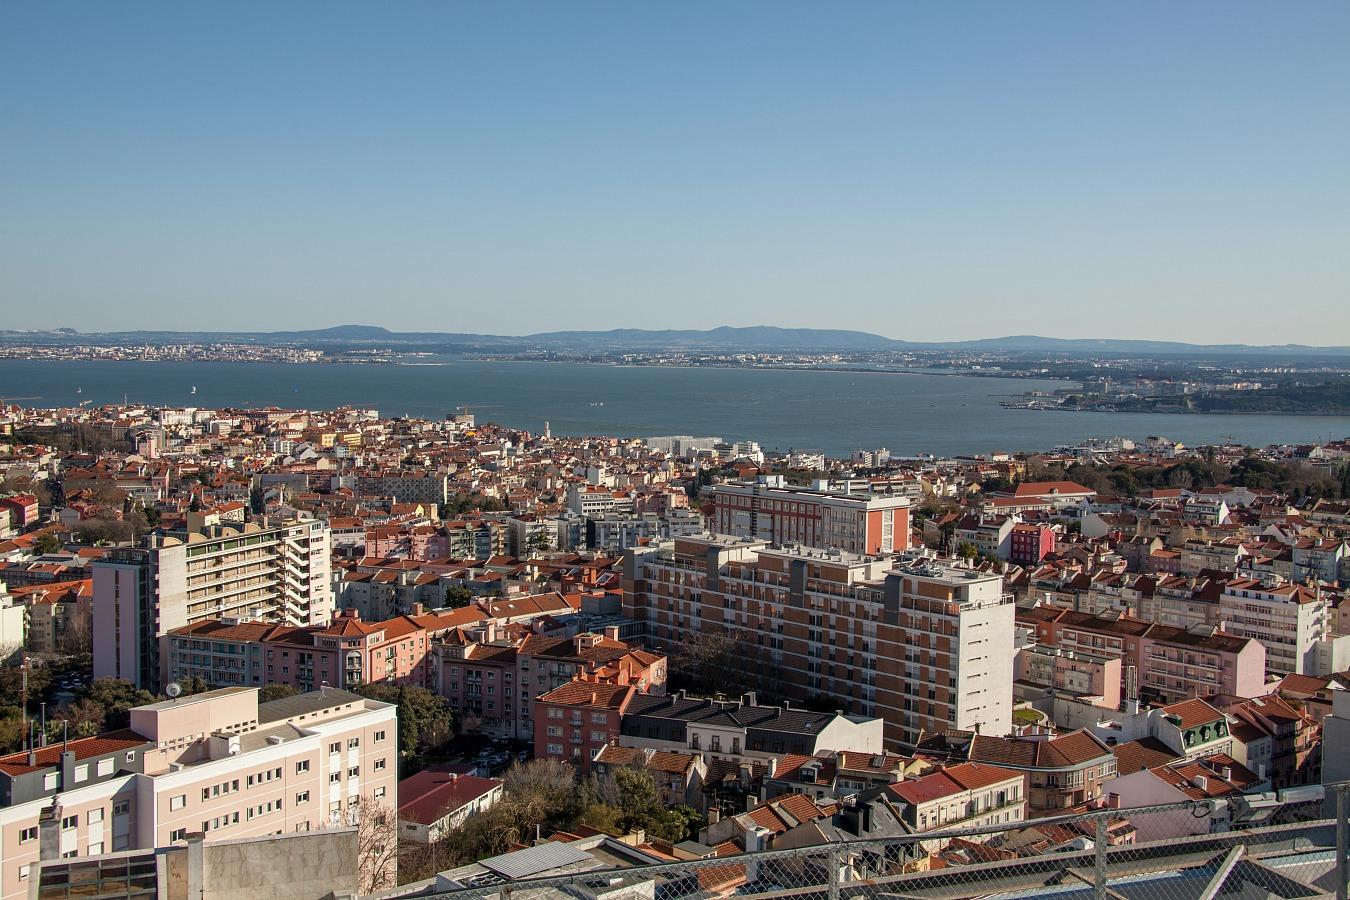 Miradouro mais alto de Lisboa abre hoje ao público